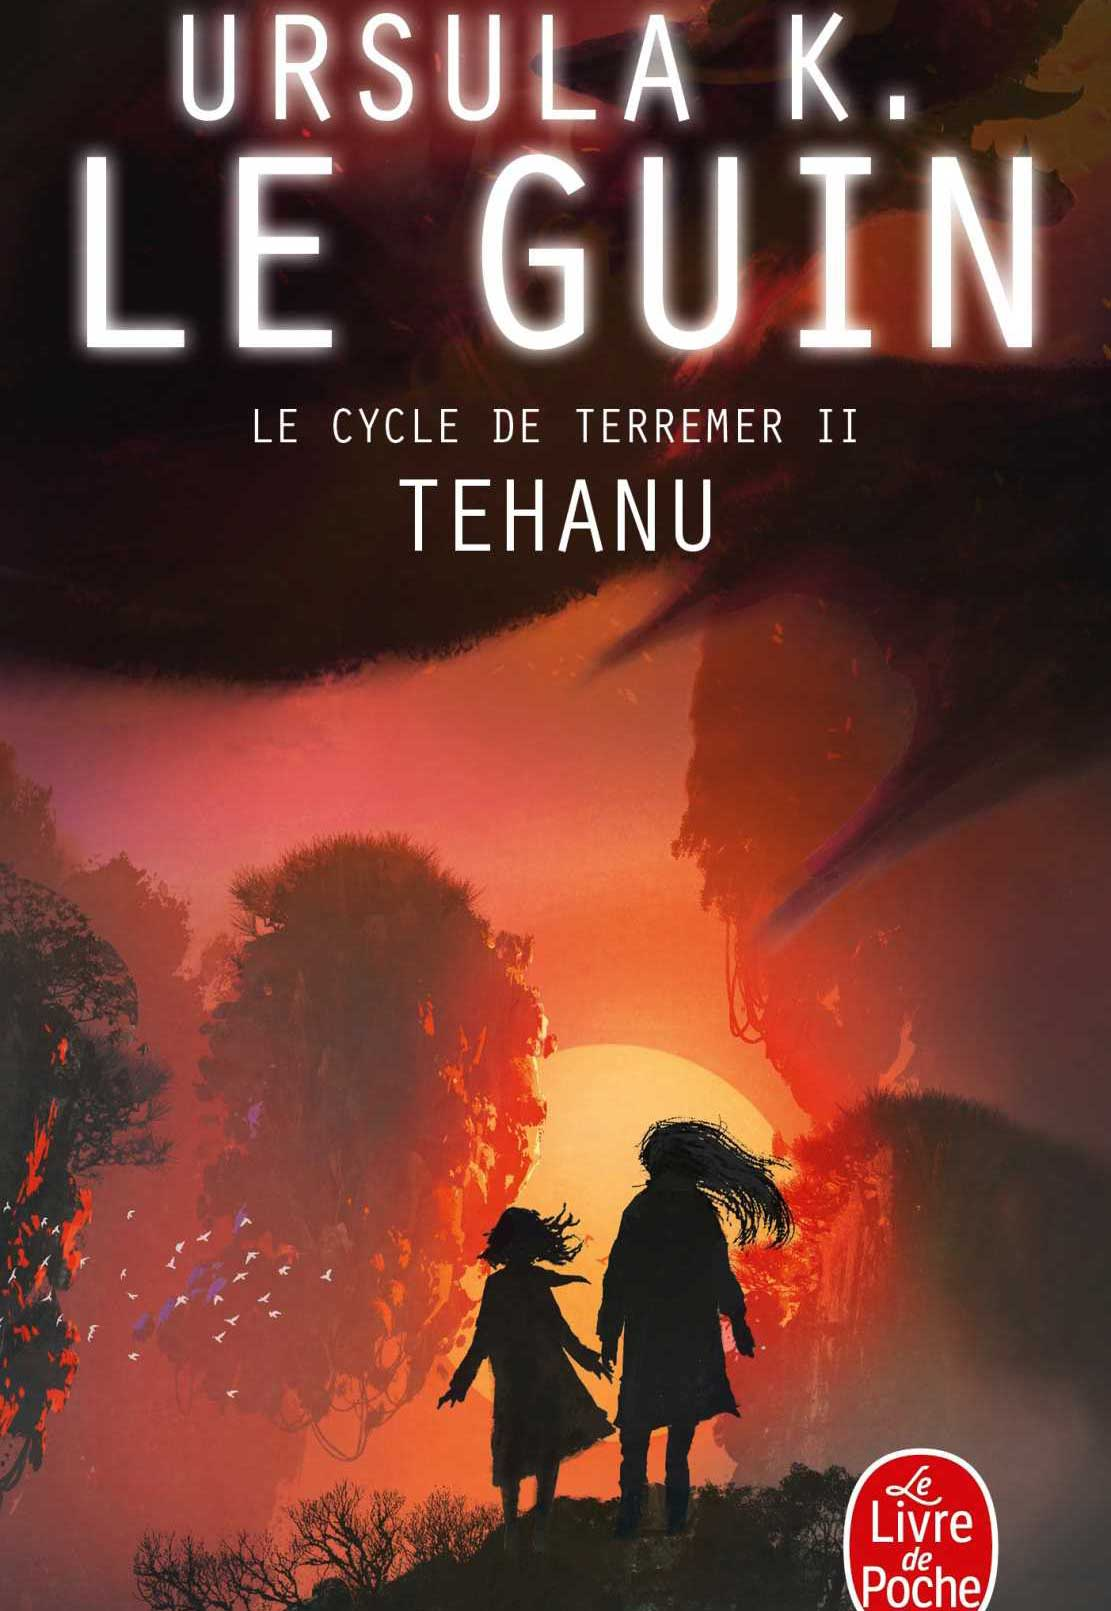 Le cycle de Terremer II : Tehanu, de Ursula Le Guin (2008)